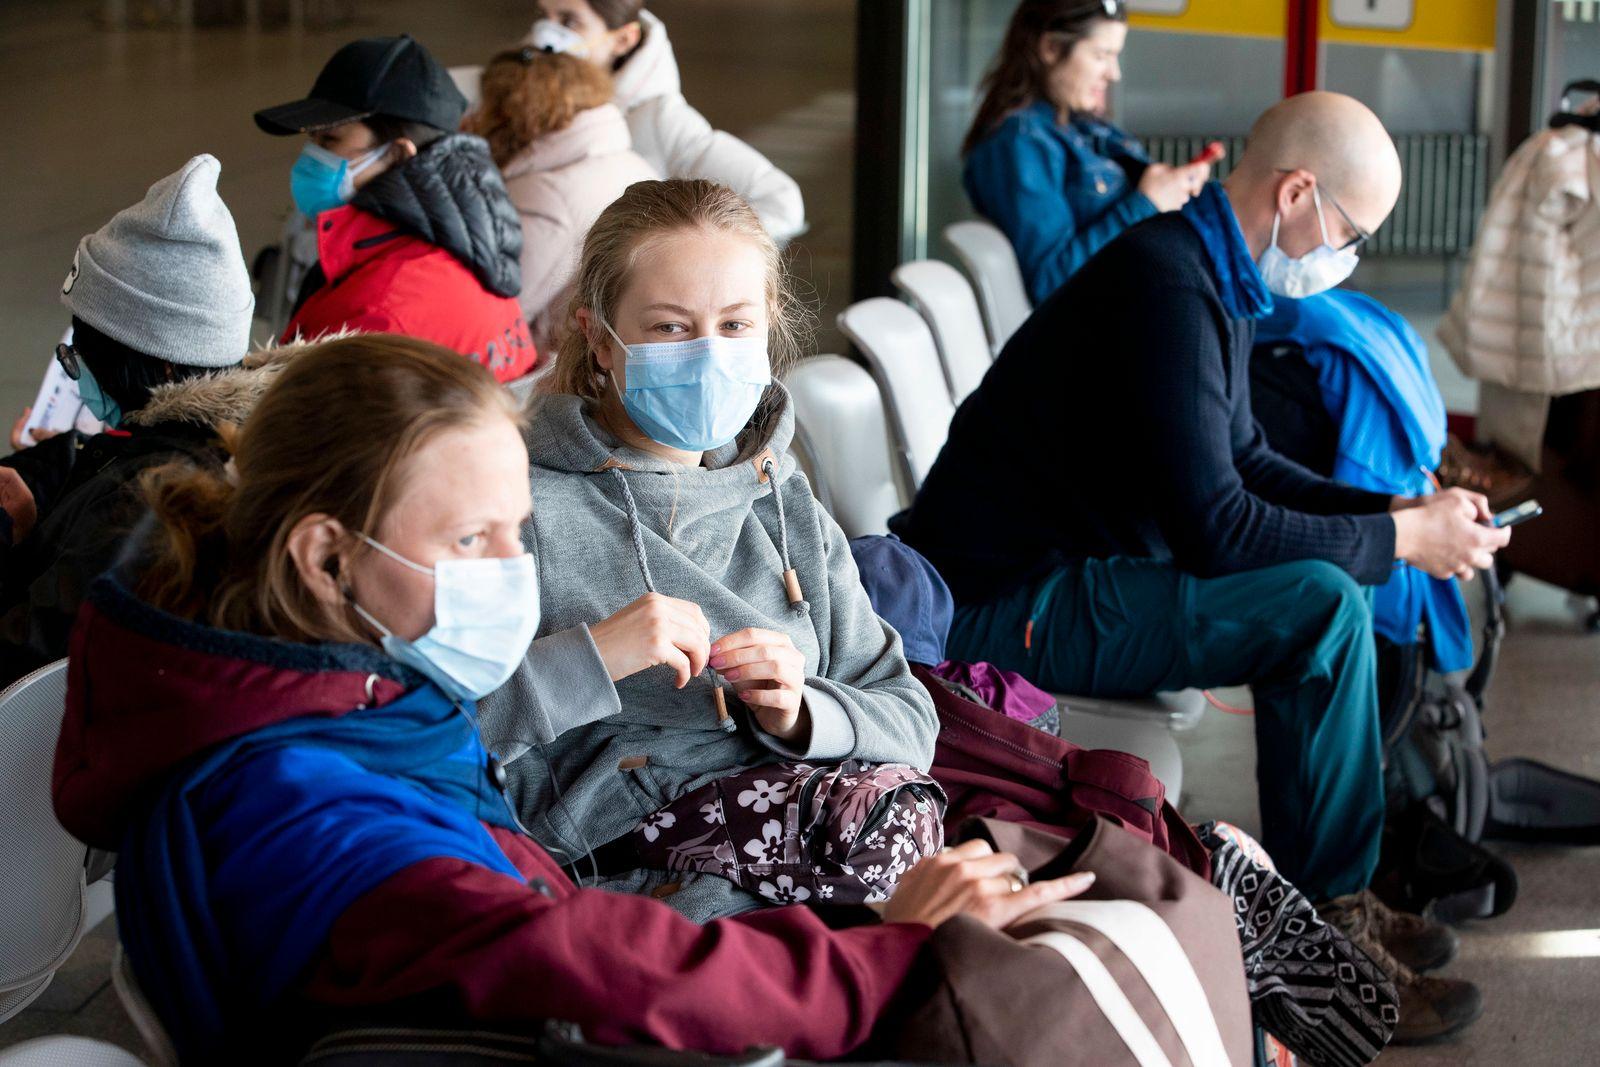 Coronavirus - Flughafen Berlin-Tegel